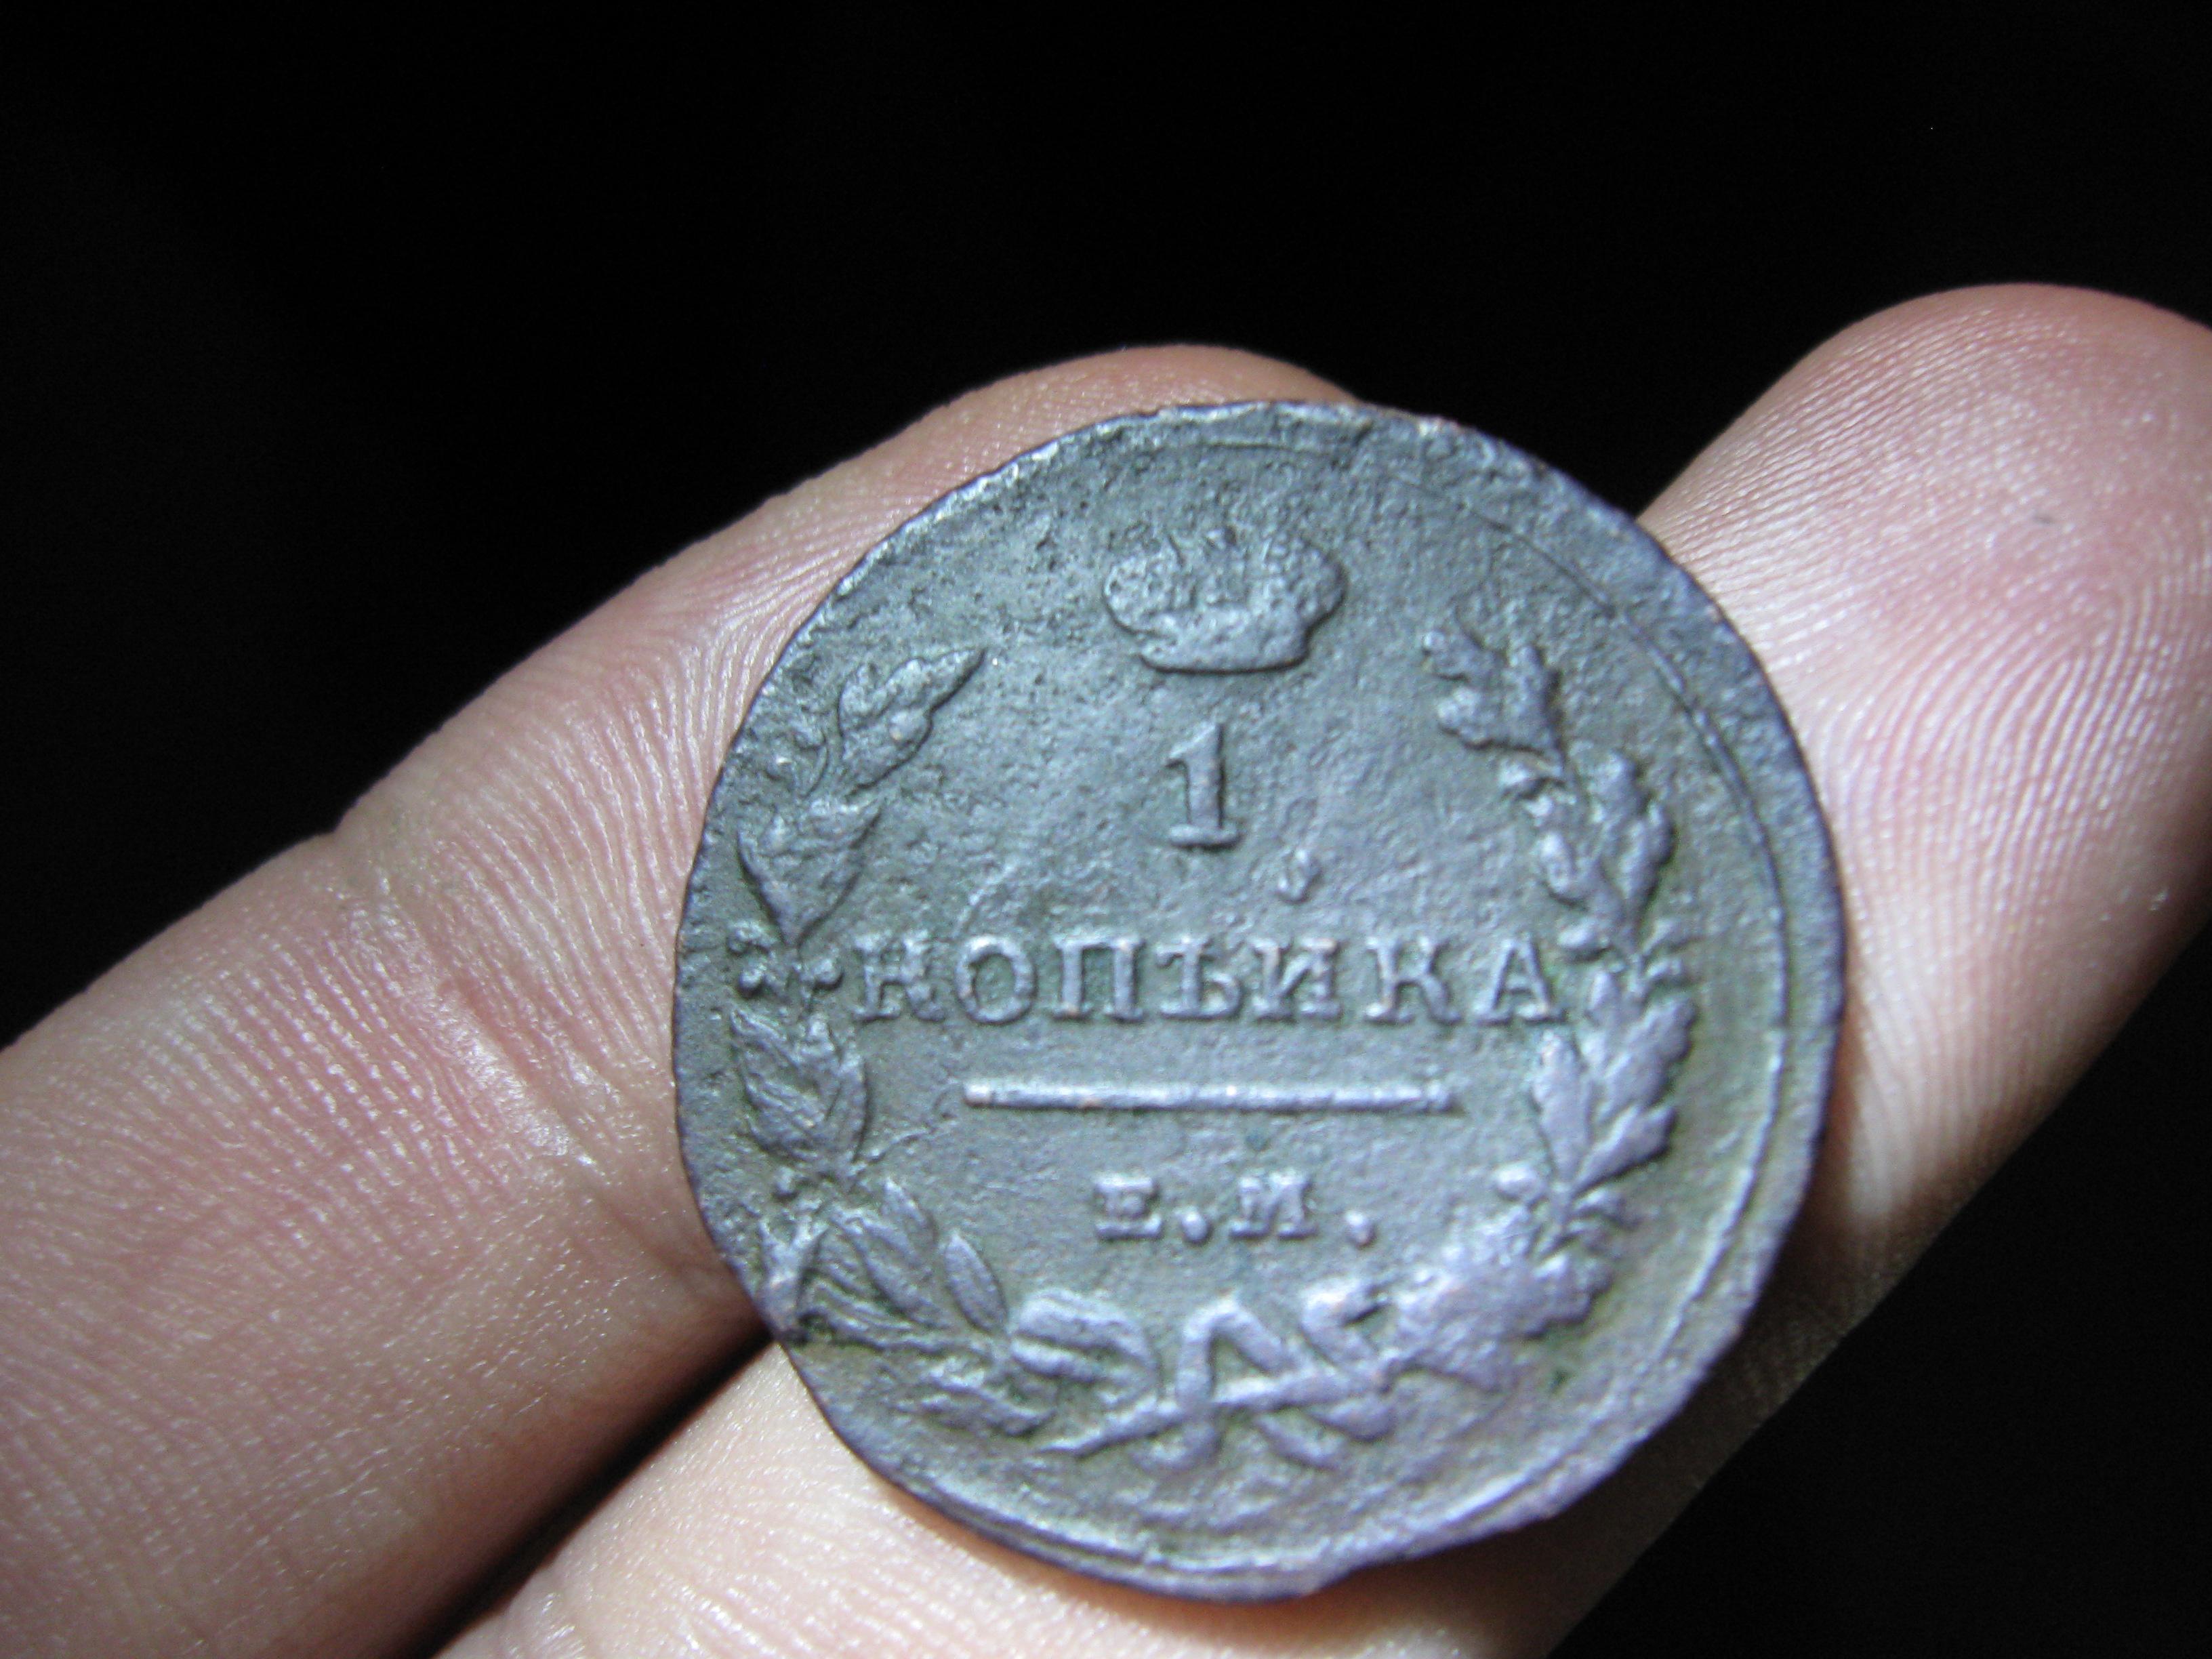 Нашол монету помогите определить монету reibert.info.